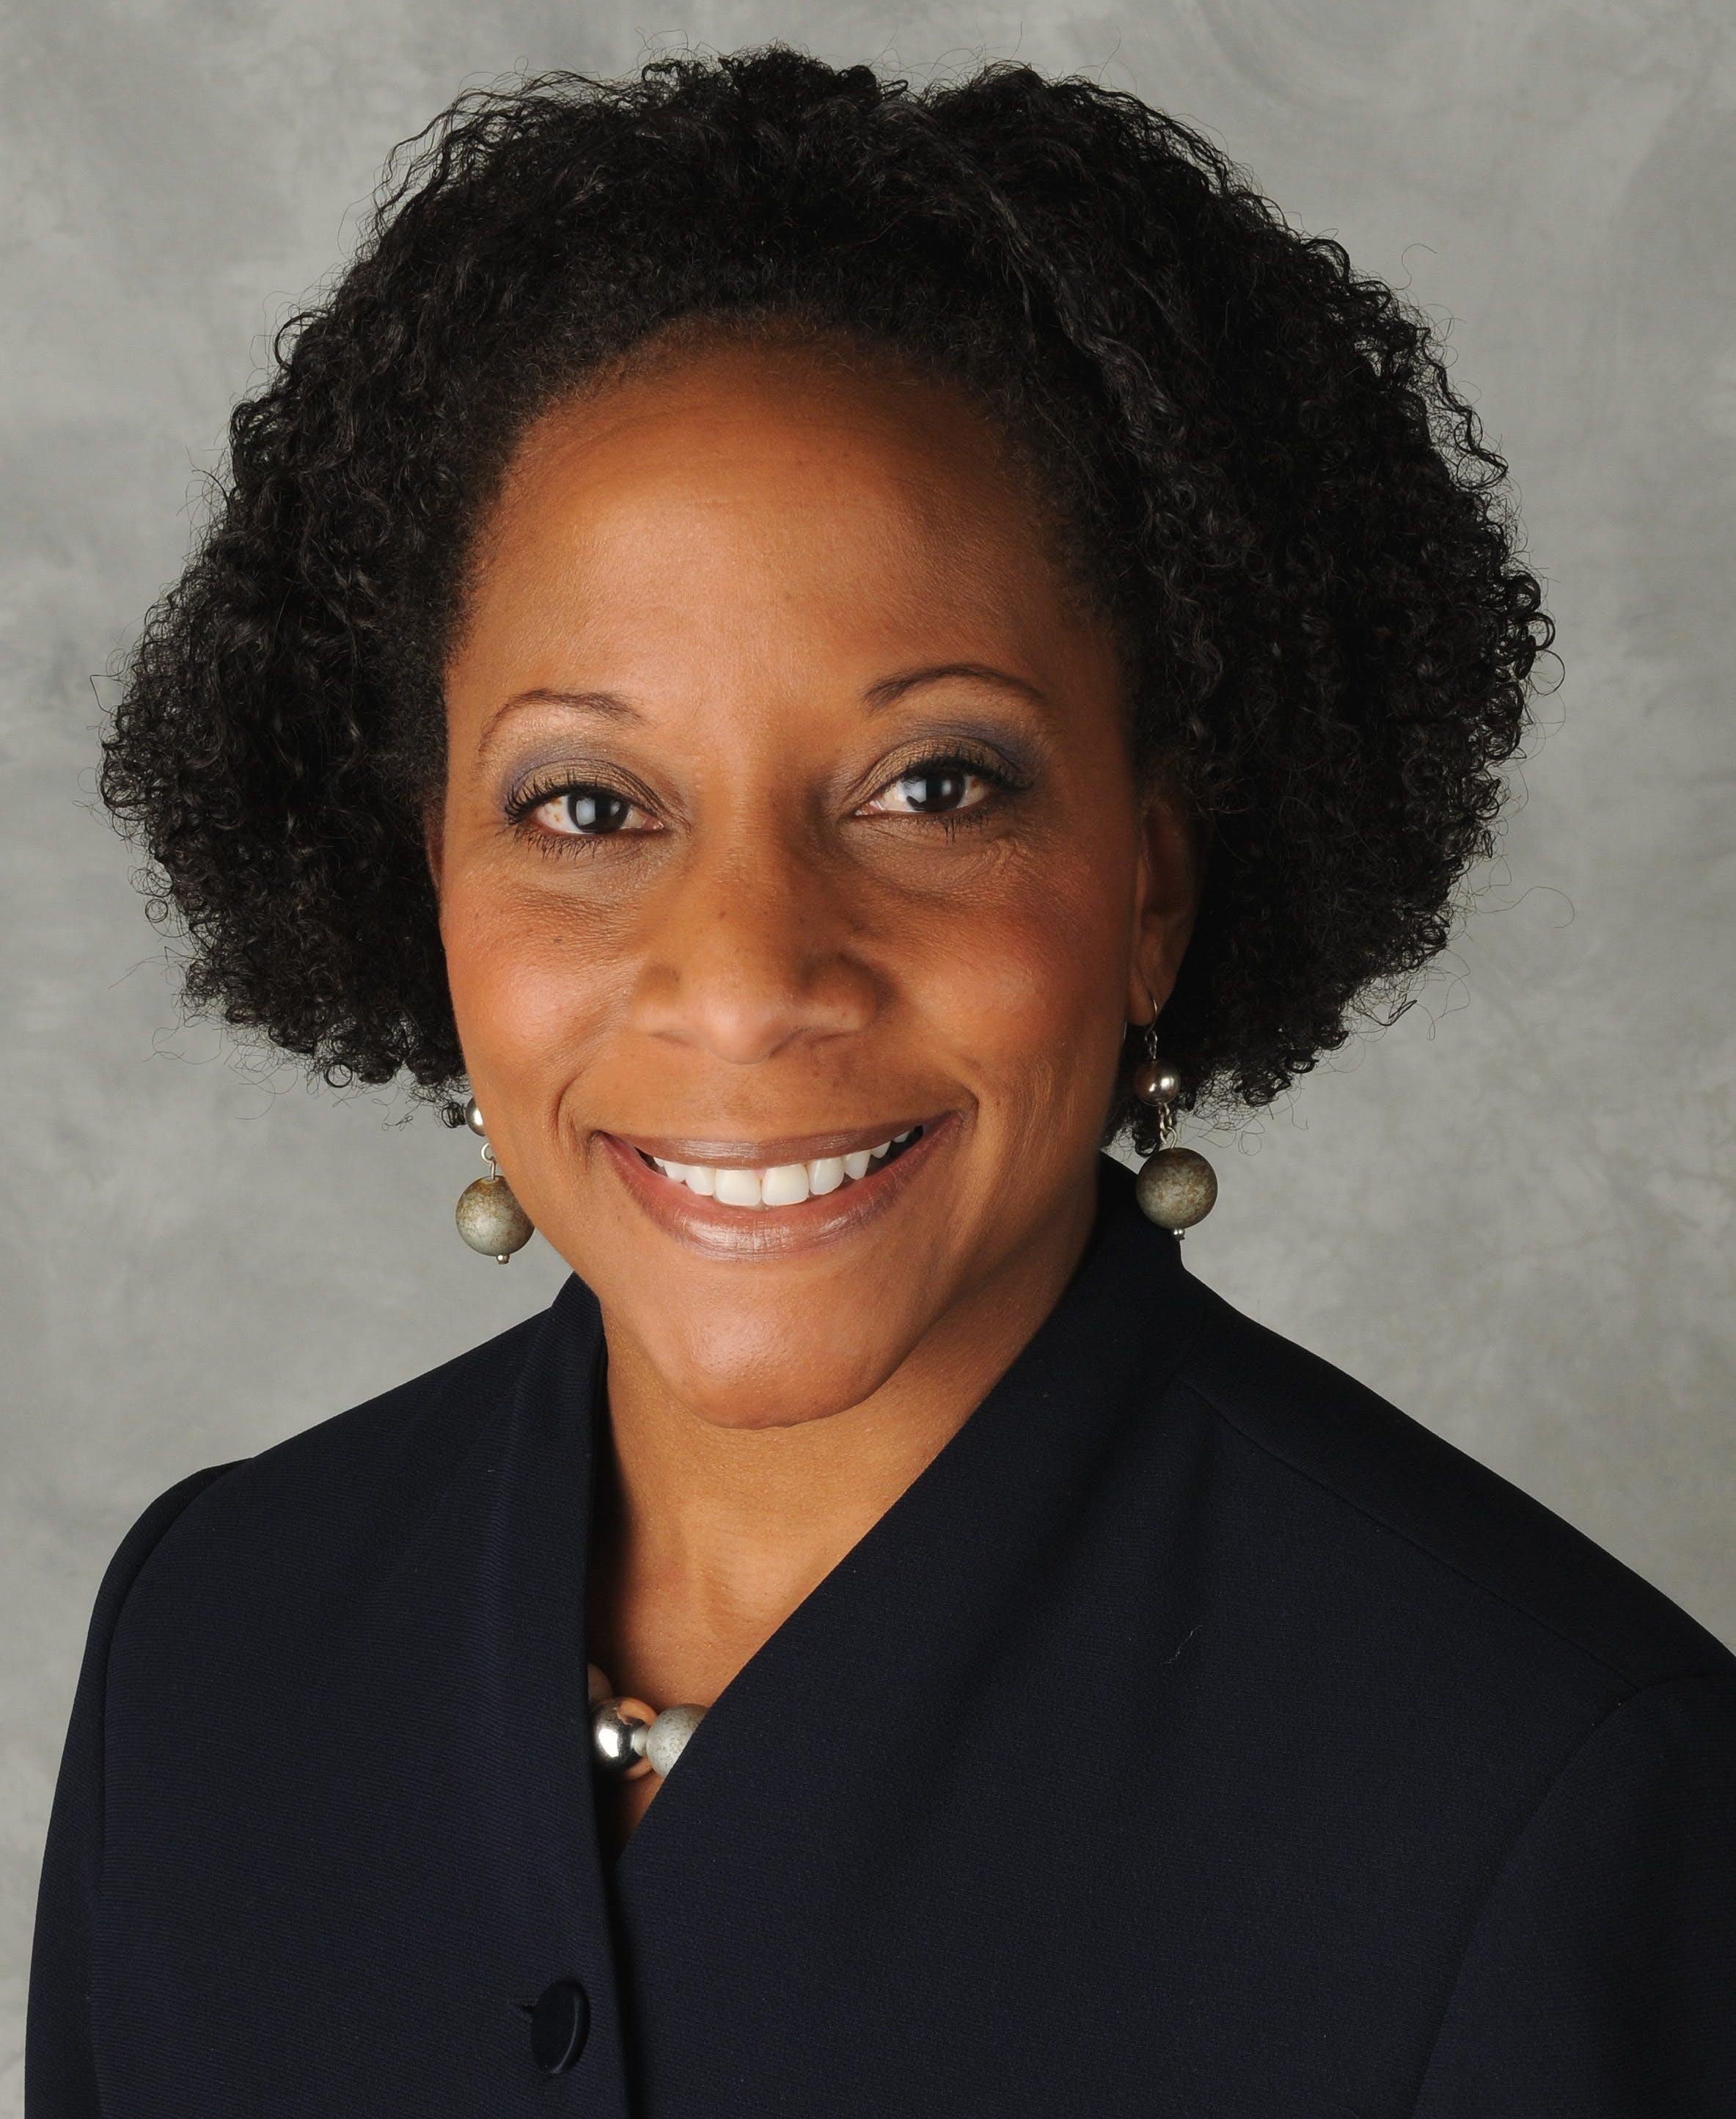 Portrait of Assistant City Administrator, Maraskeshia Smith